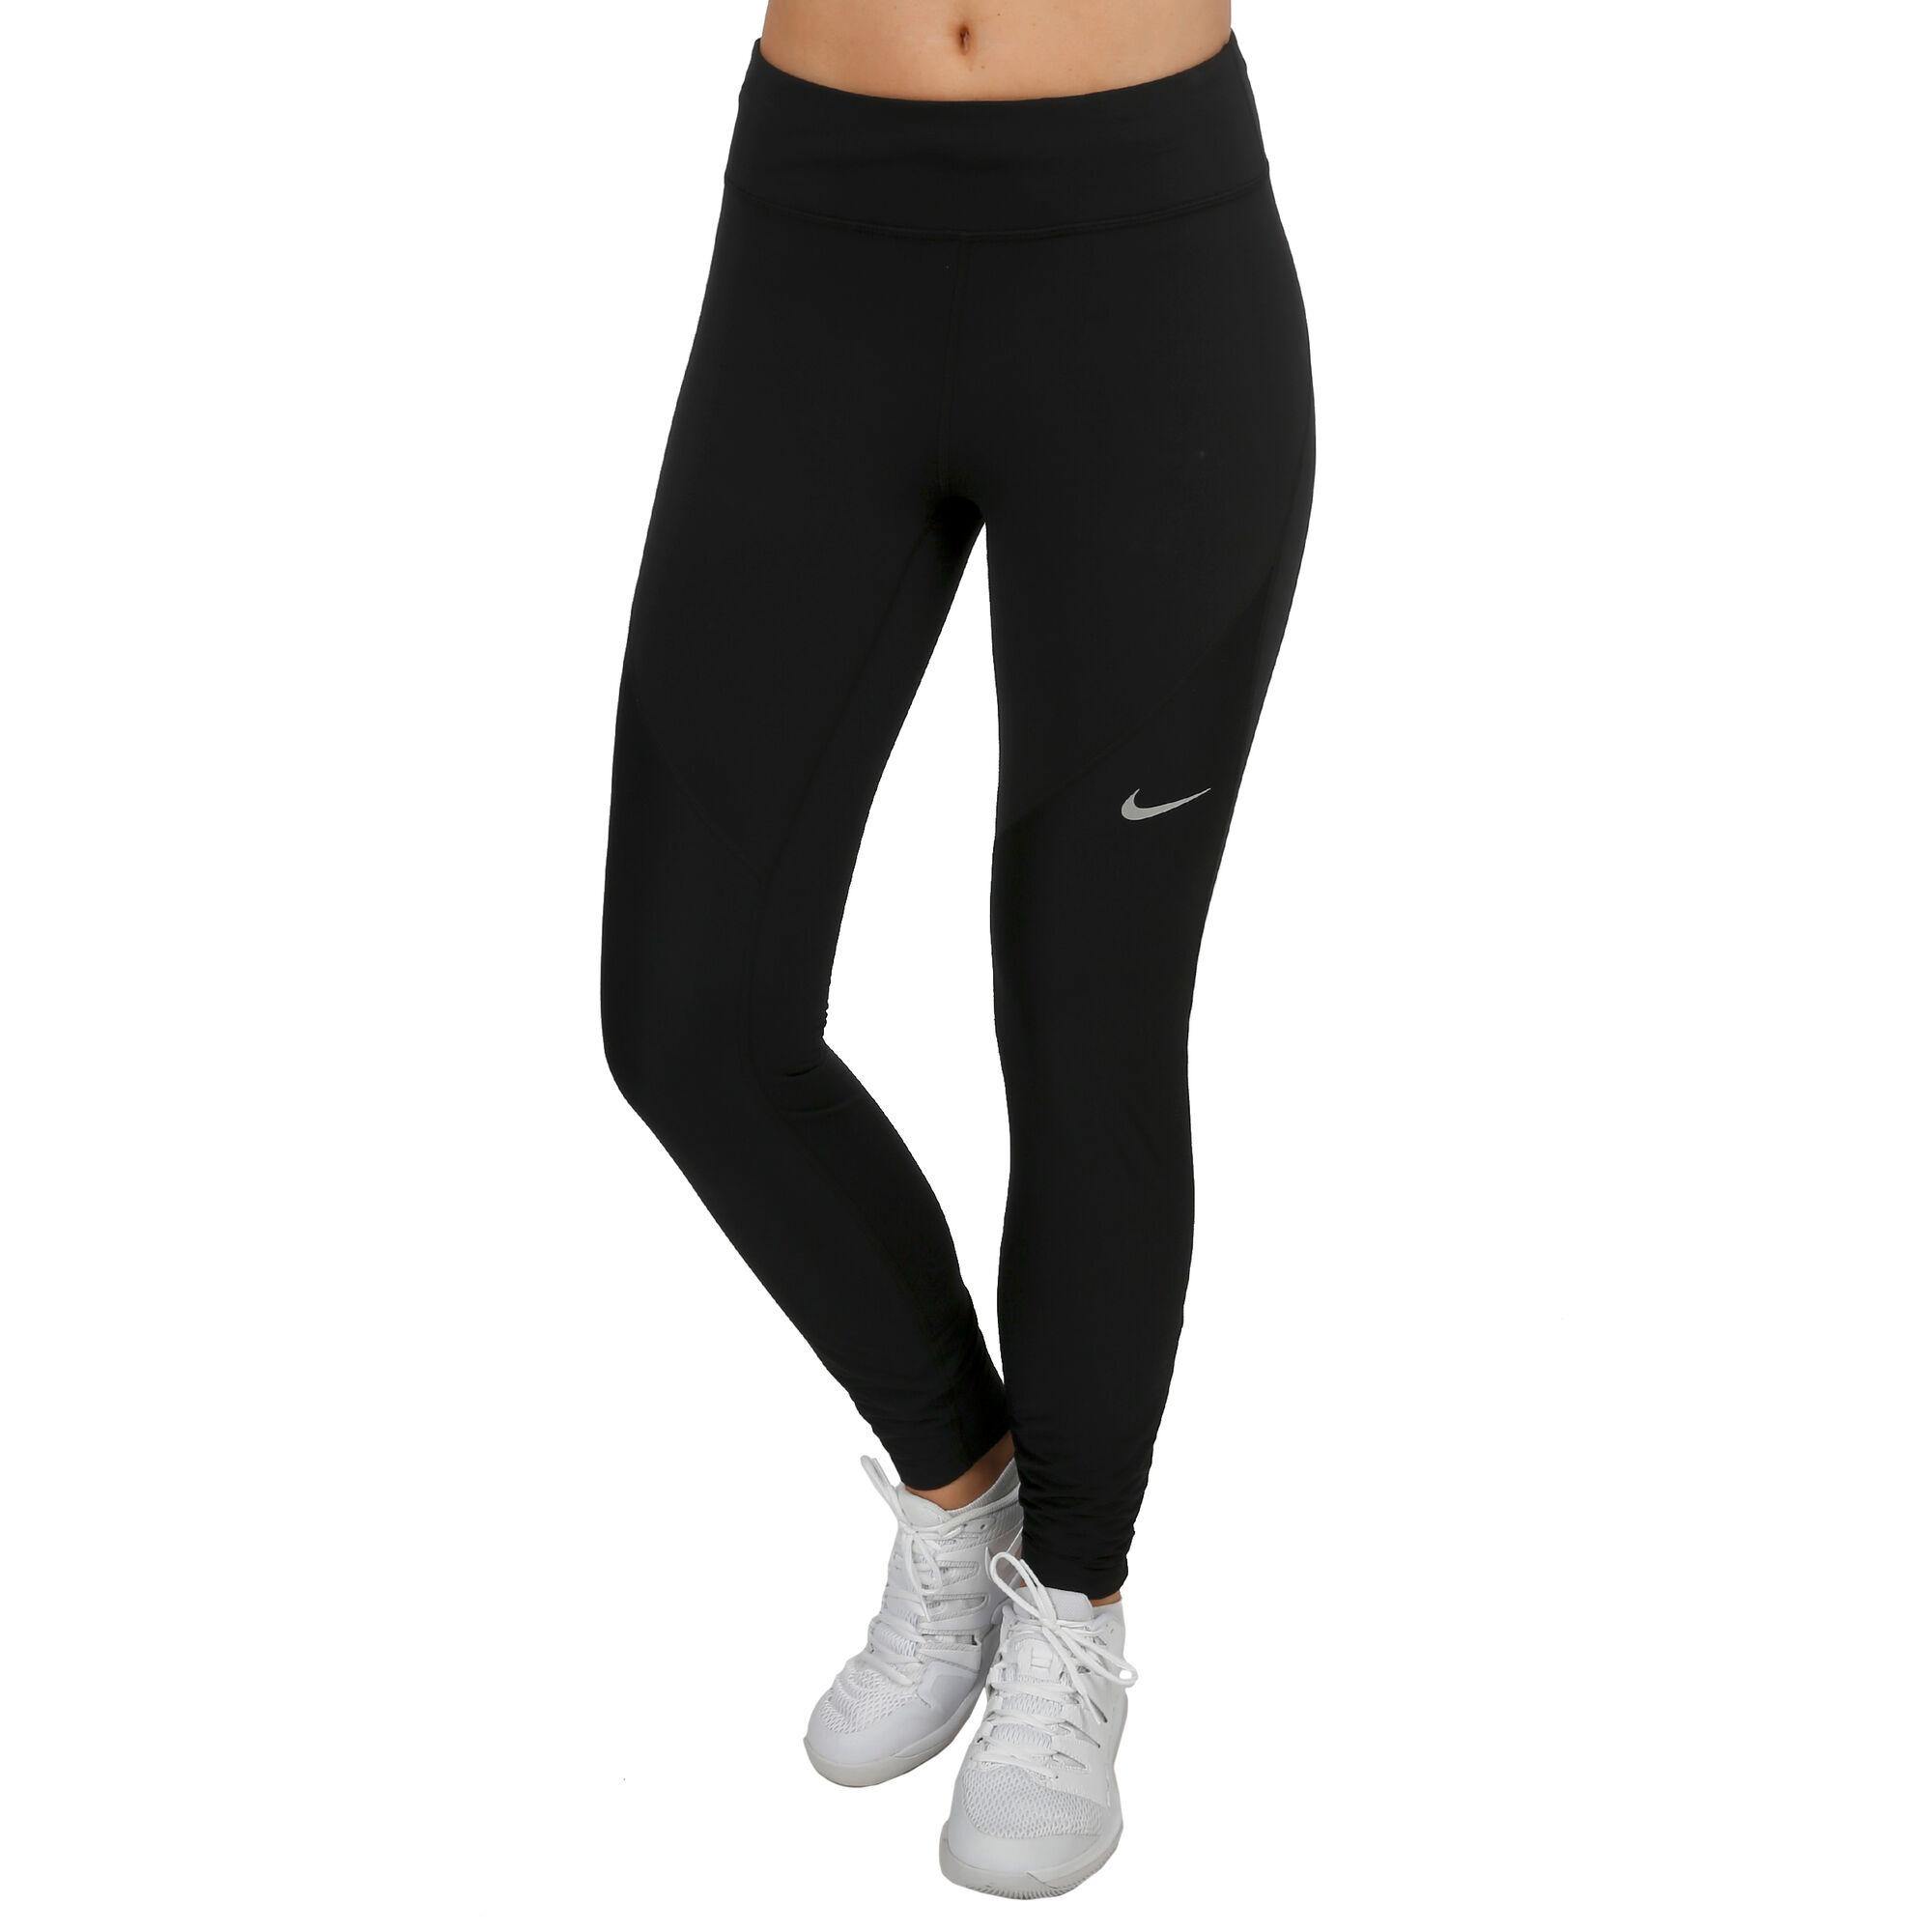 fffea023c50f Nike · Nike · Nike · Nike · Nike · Nike · Nike · Nike · Nike · Nike. Epic  Lux Shield Running Tight Women ...